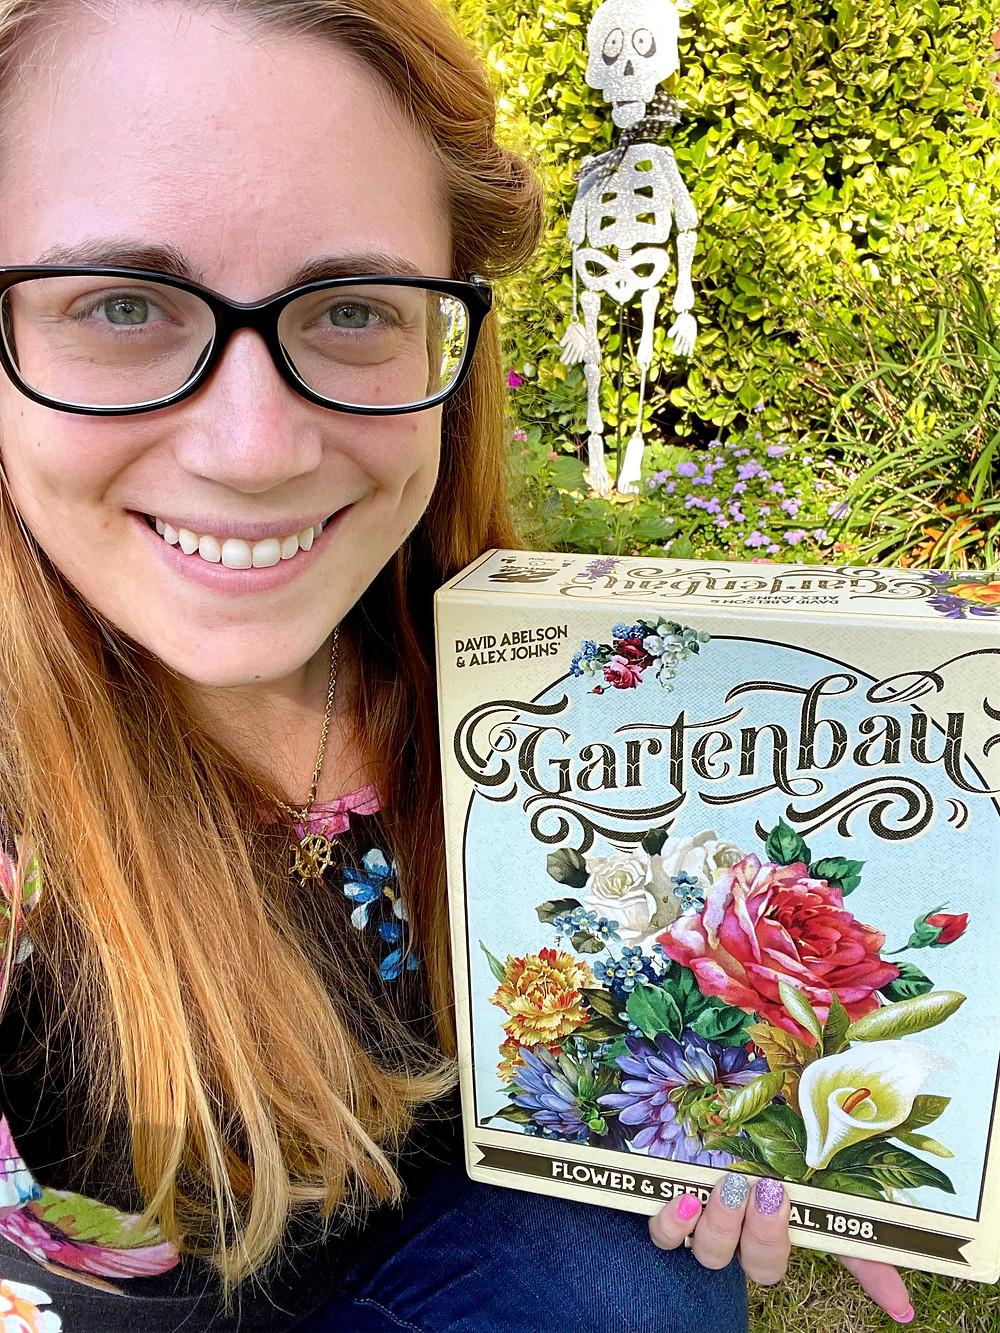 Jacqueline with the Gartenbau box